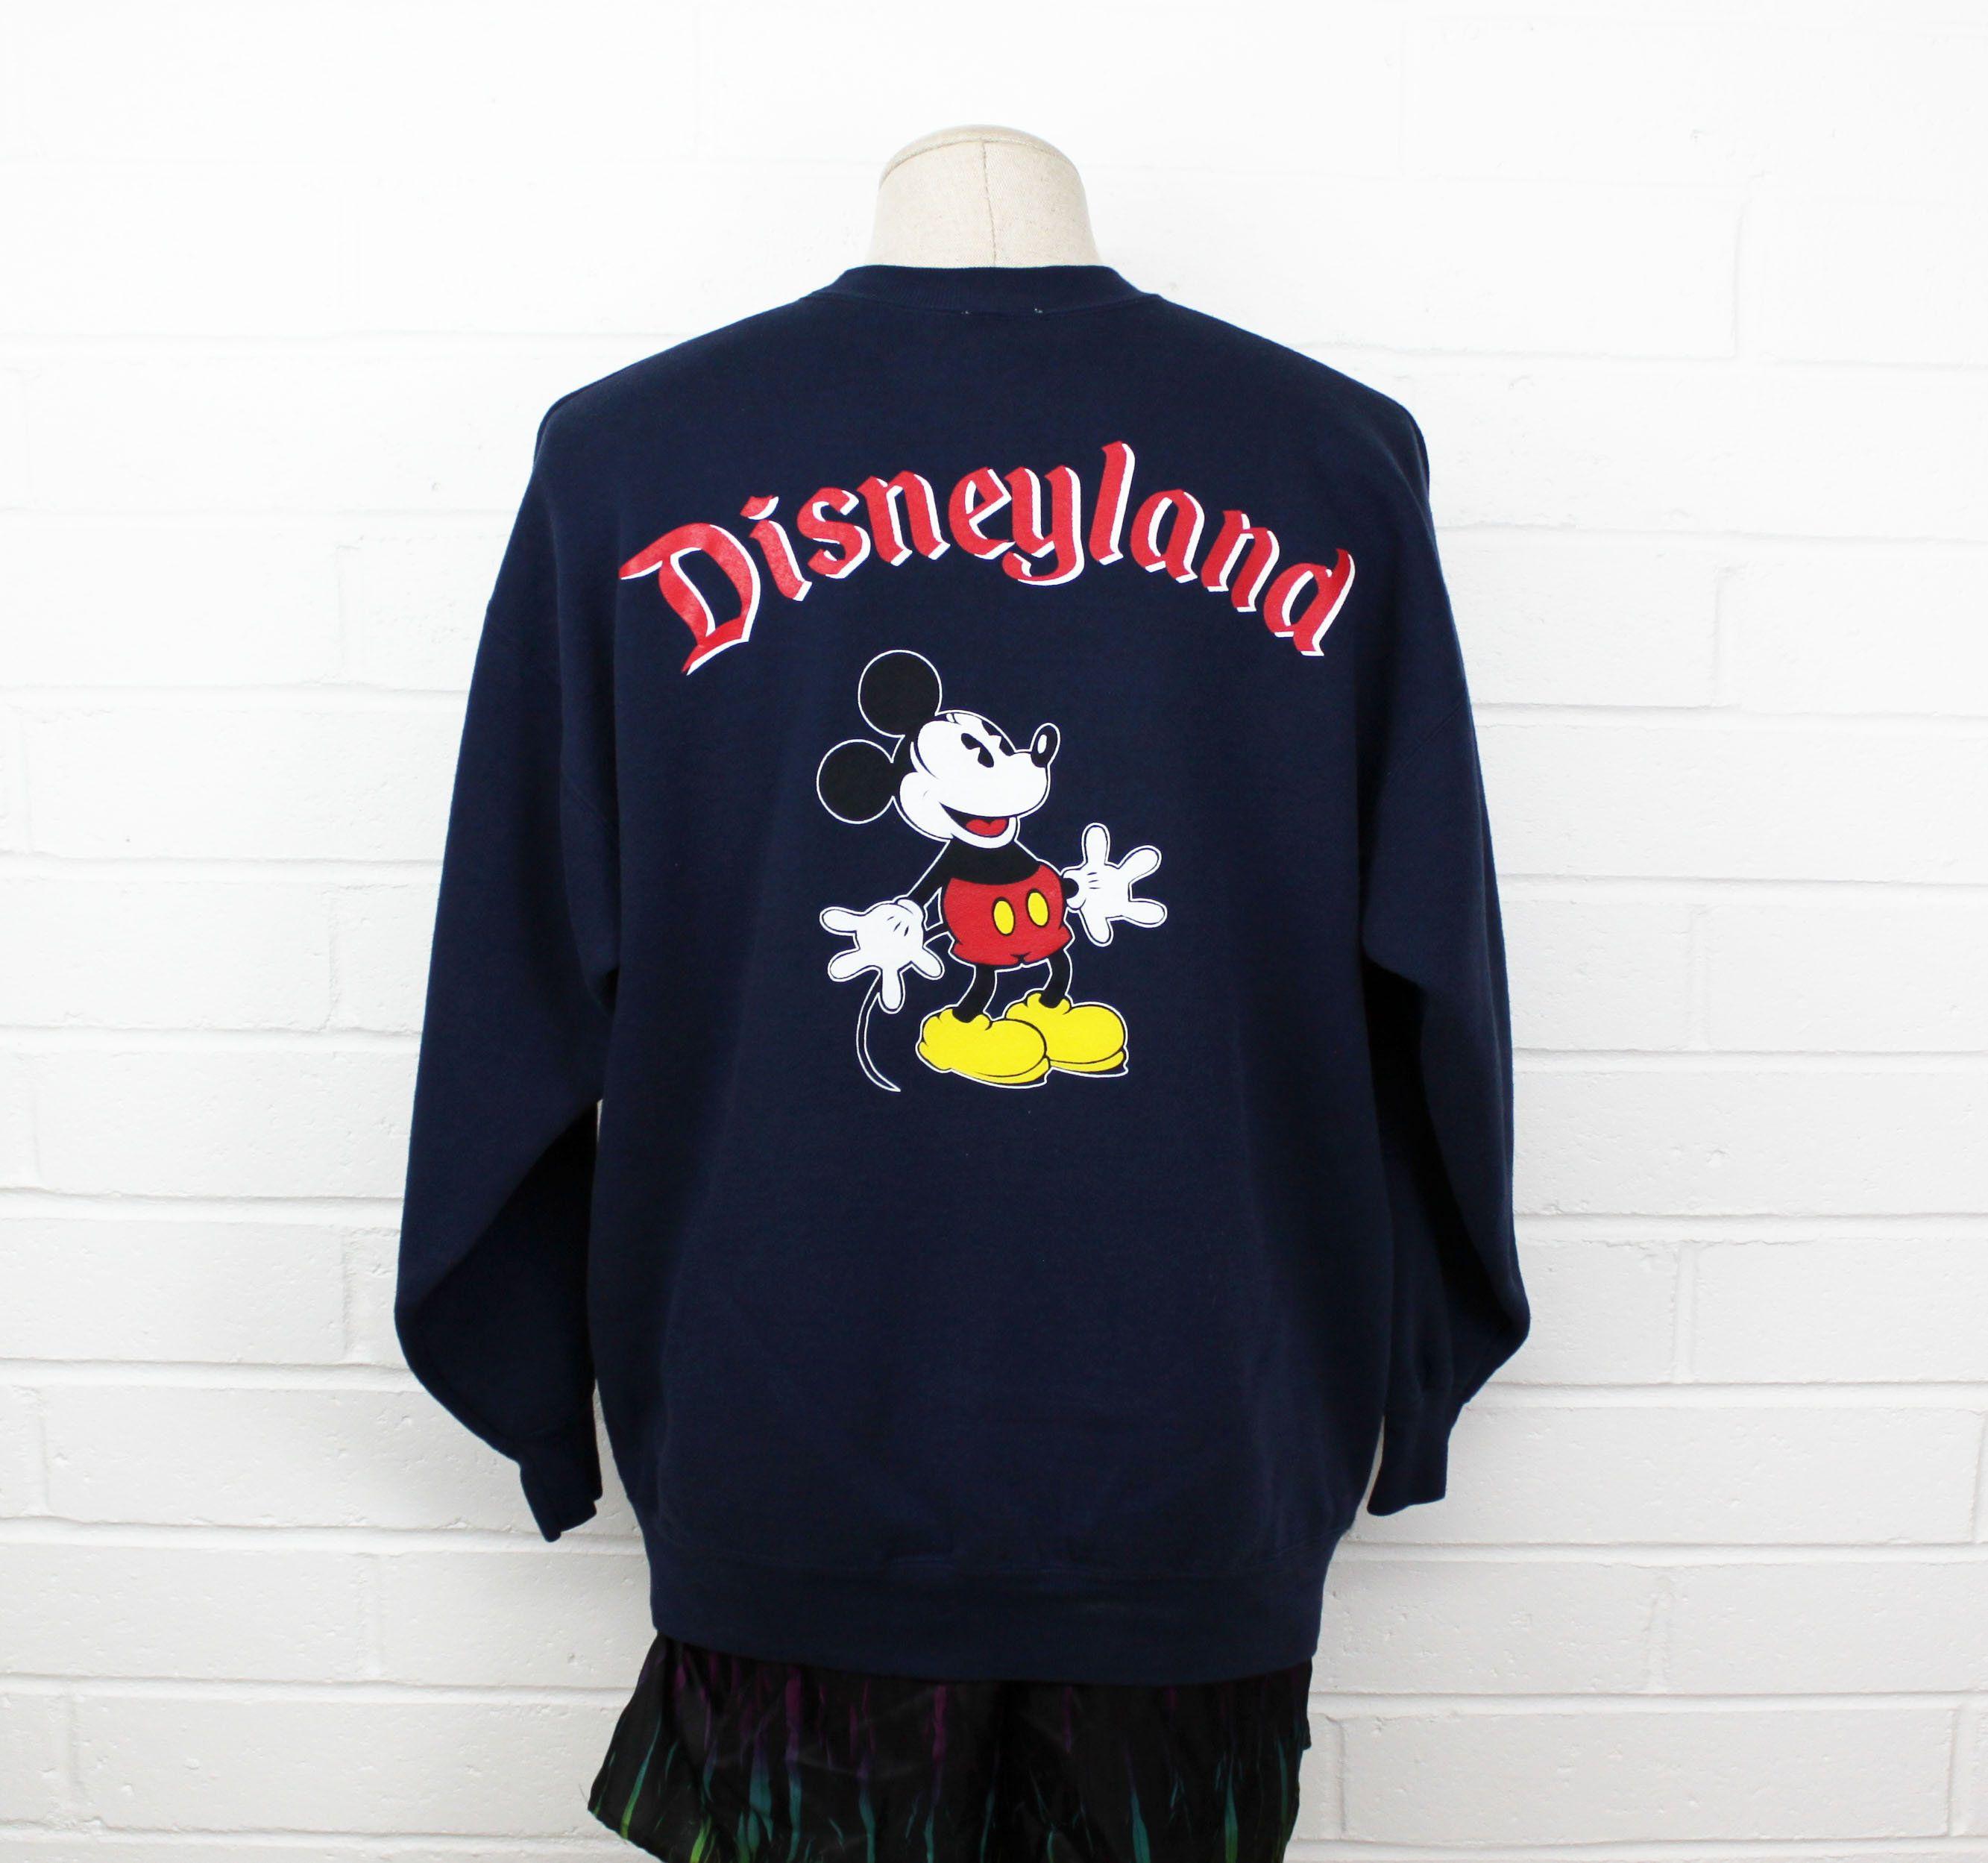 Vintage 90s Disneyland Sweatshirt XL Navy Blue Mickey Mouse